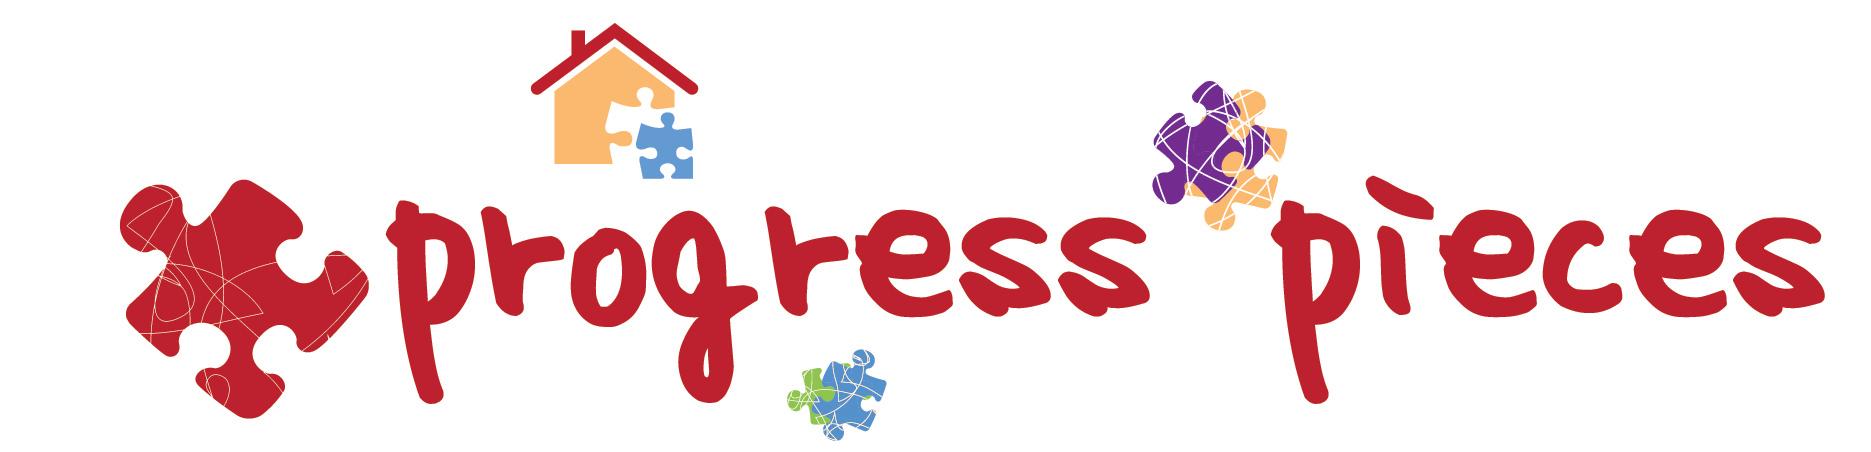 progress pieces twitter logo.png